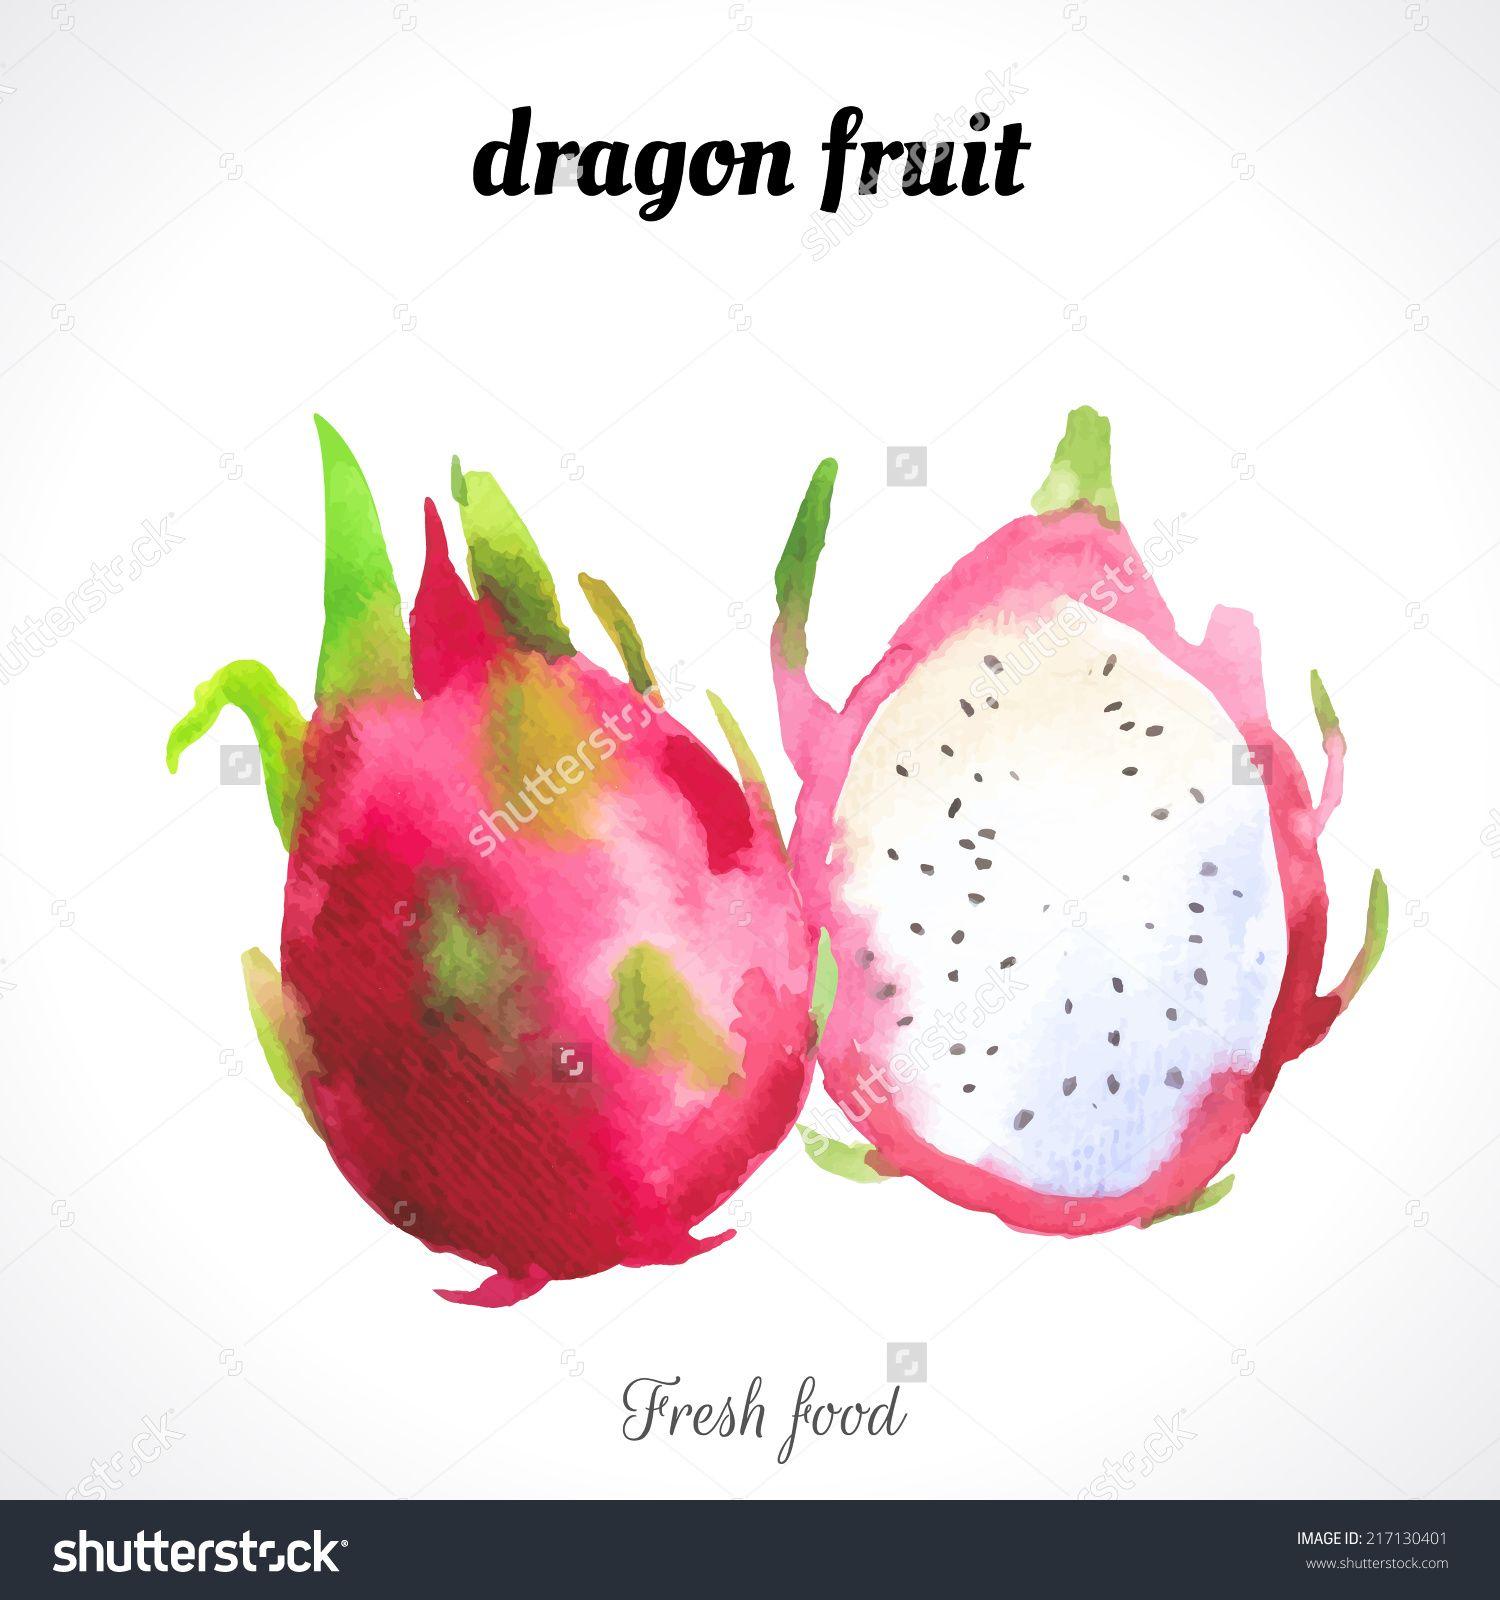 Watercolor Dragon Fruit Provencal Style Recent Watercolor